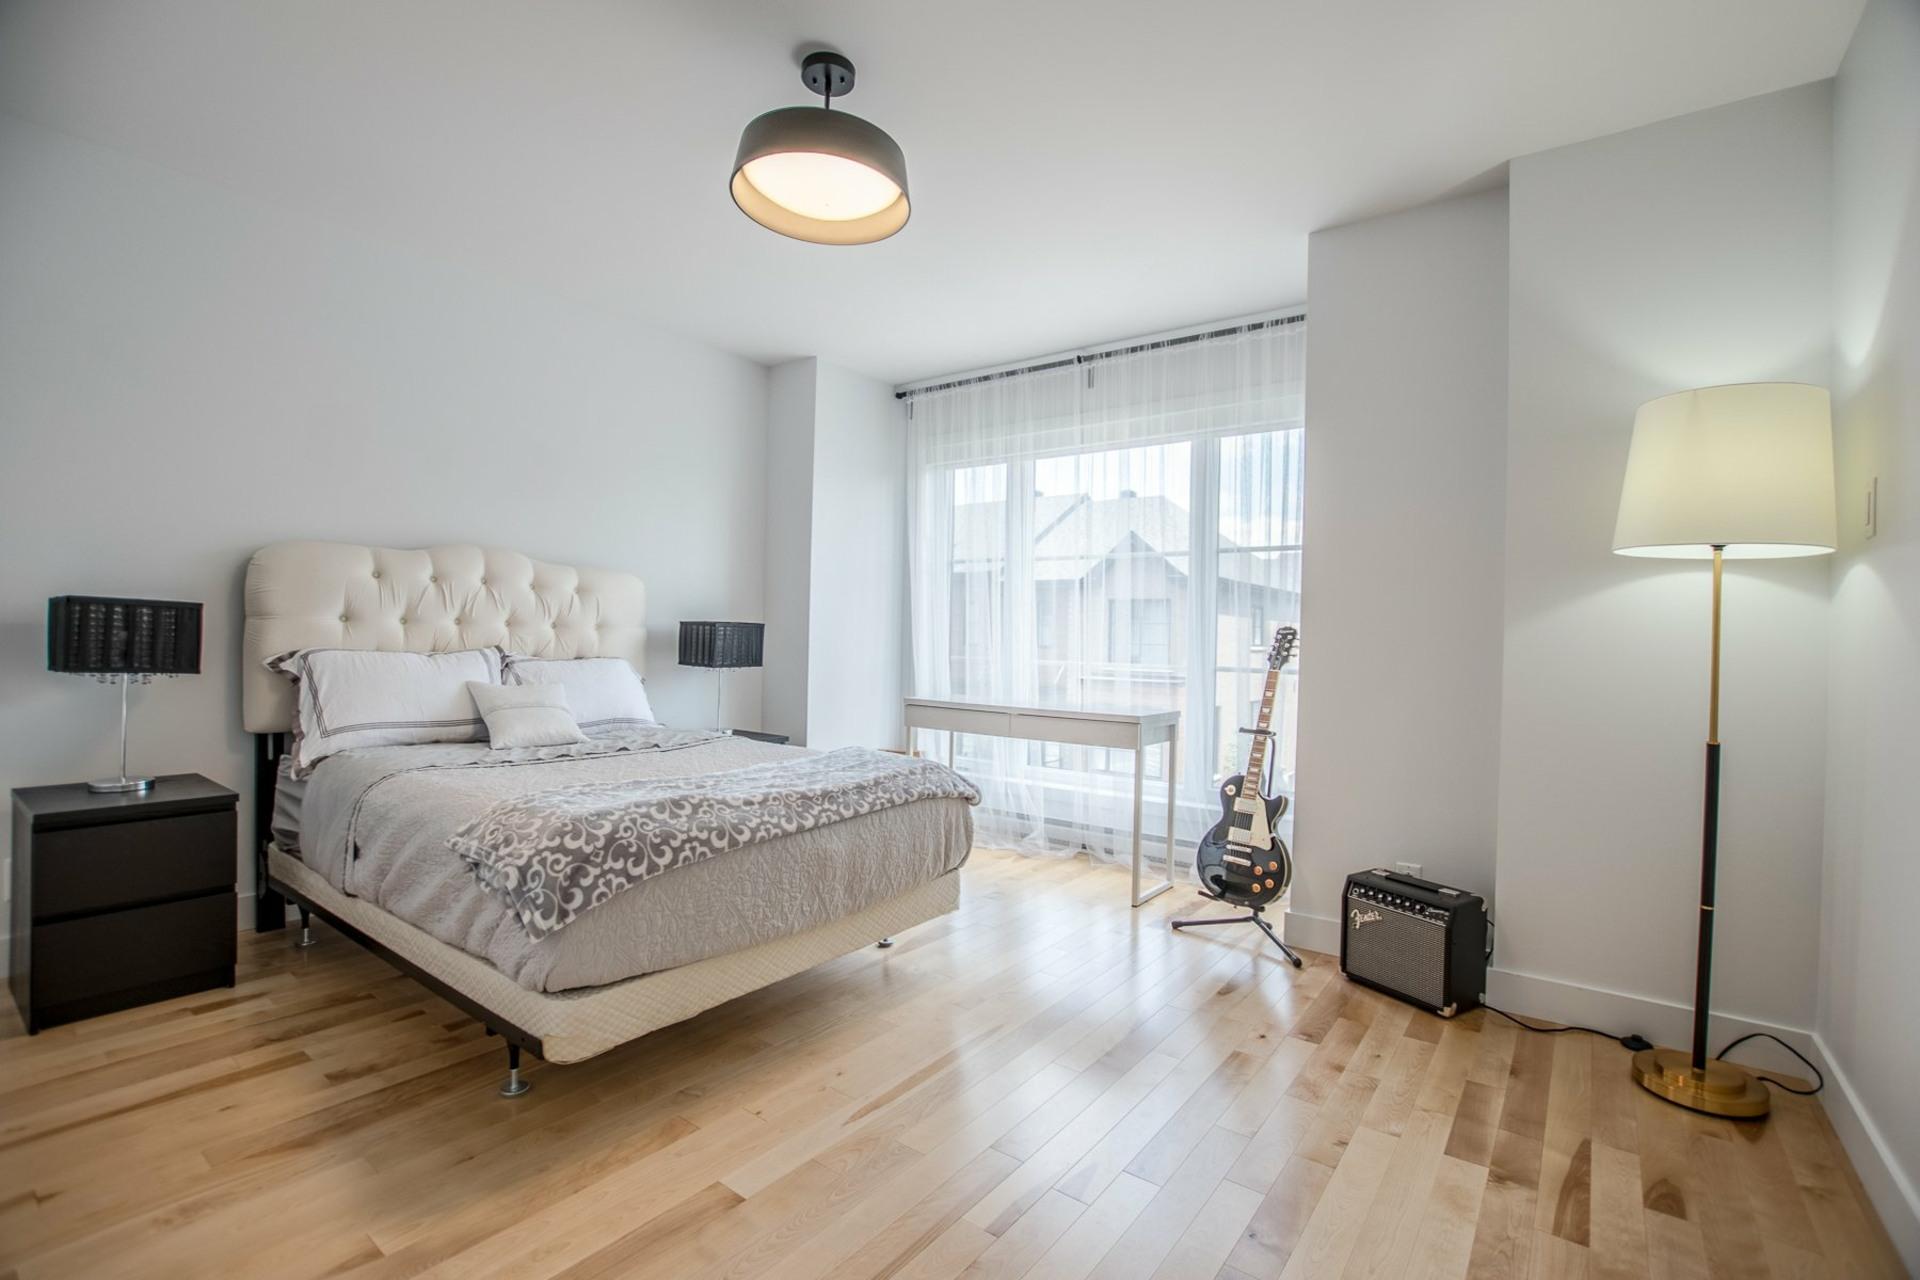 image 14 - MX - Casa sola - MX En venta Saint-Constant - 10 habitaciones